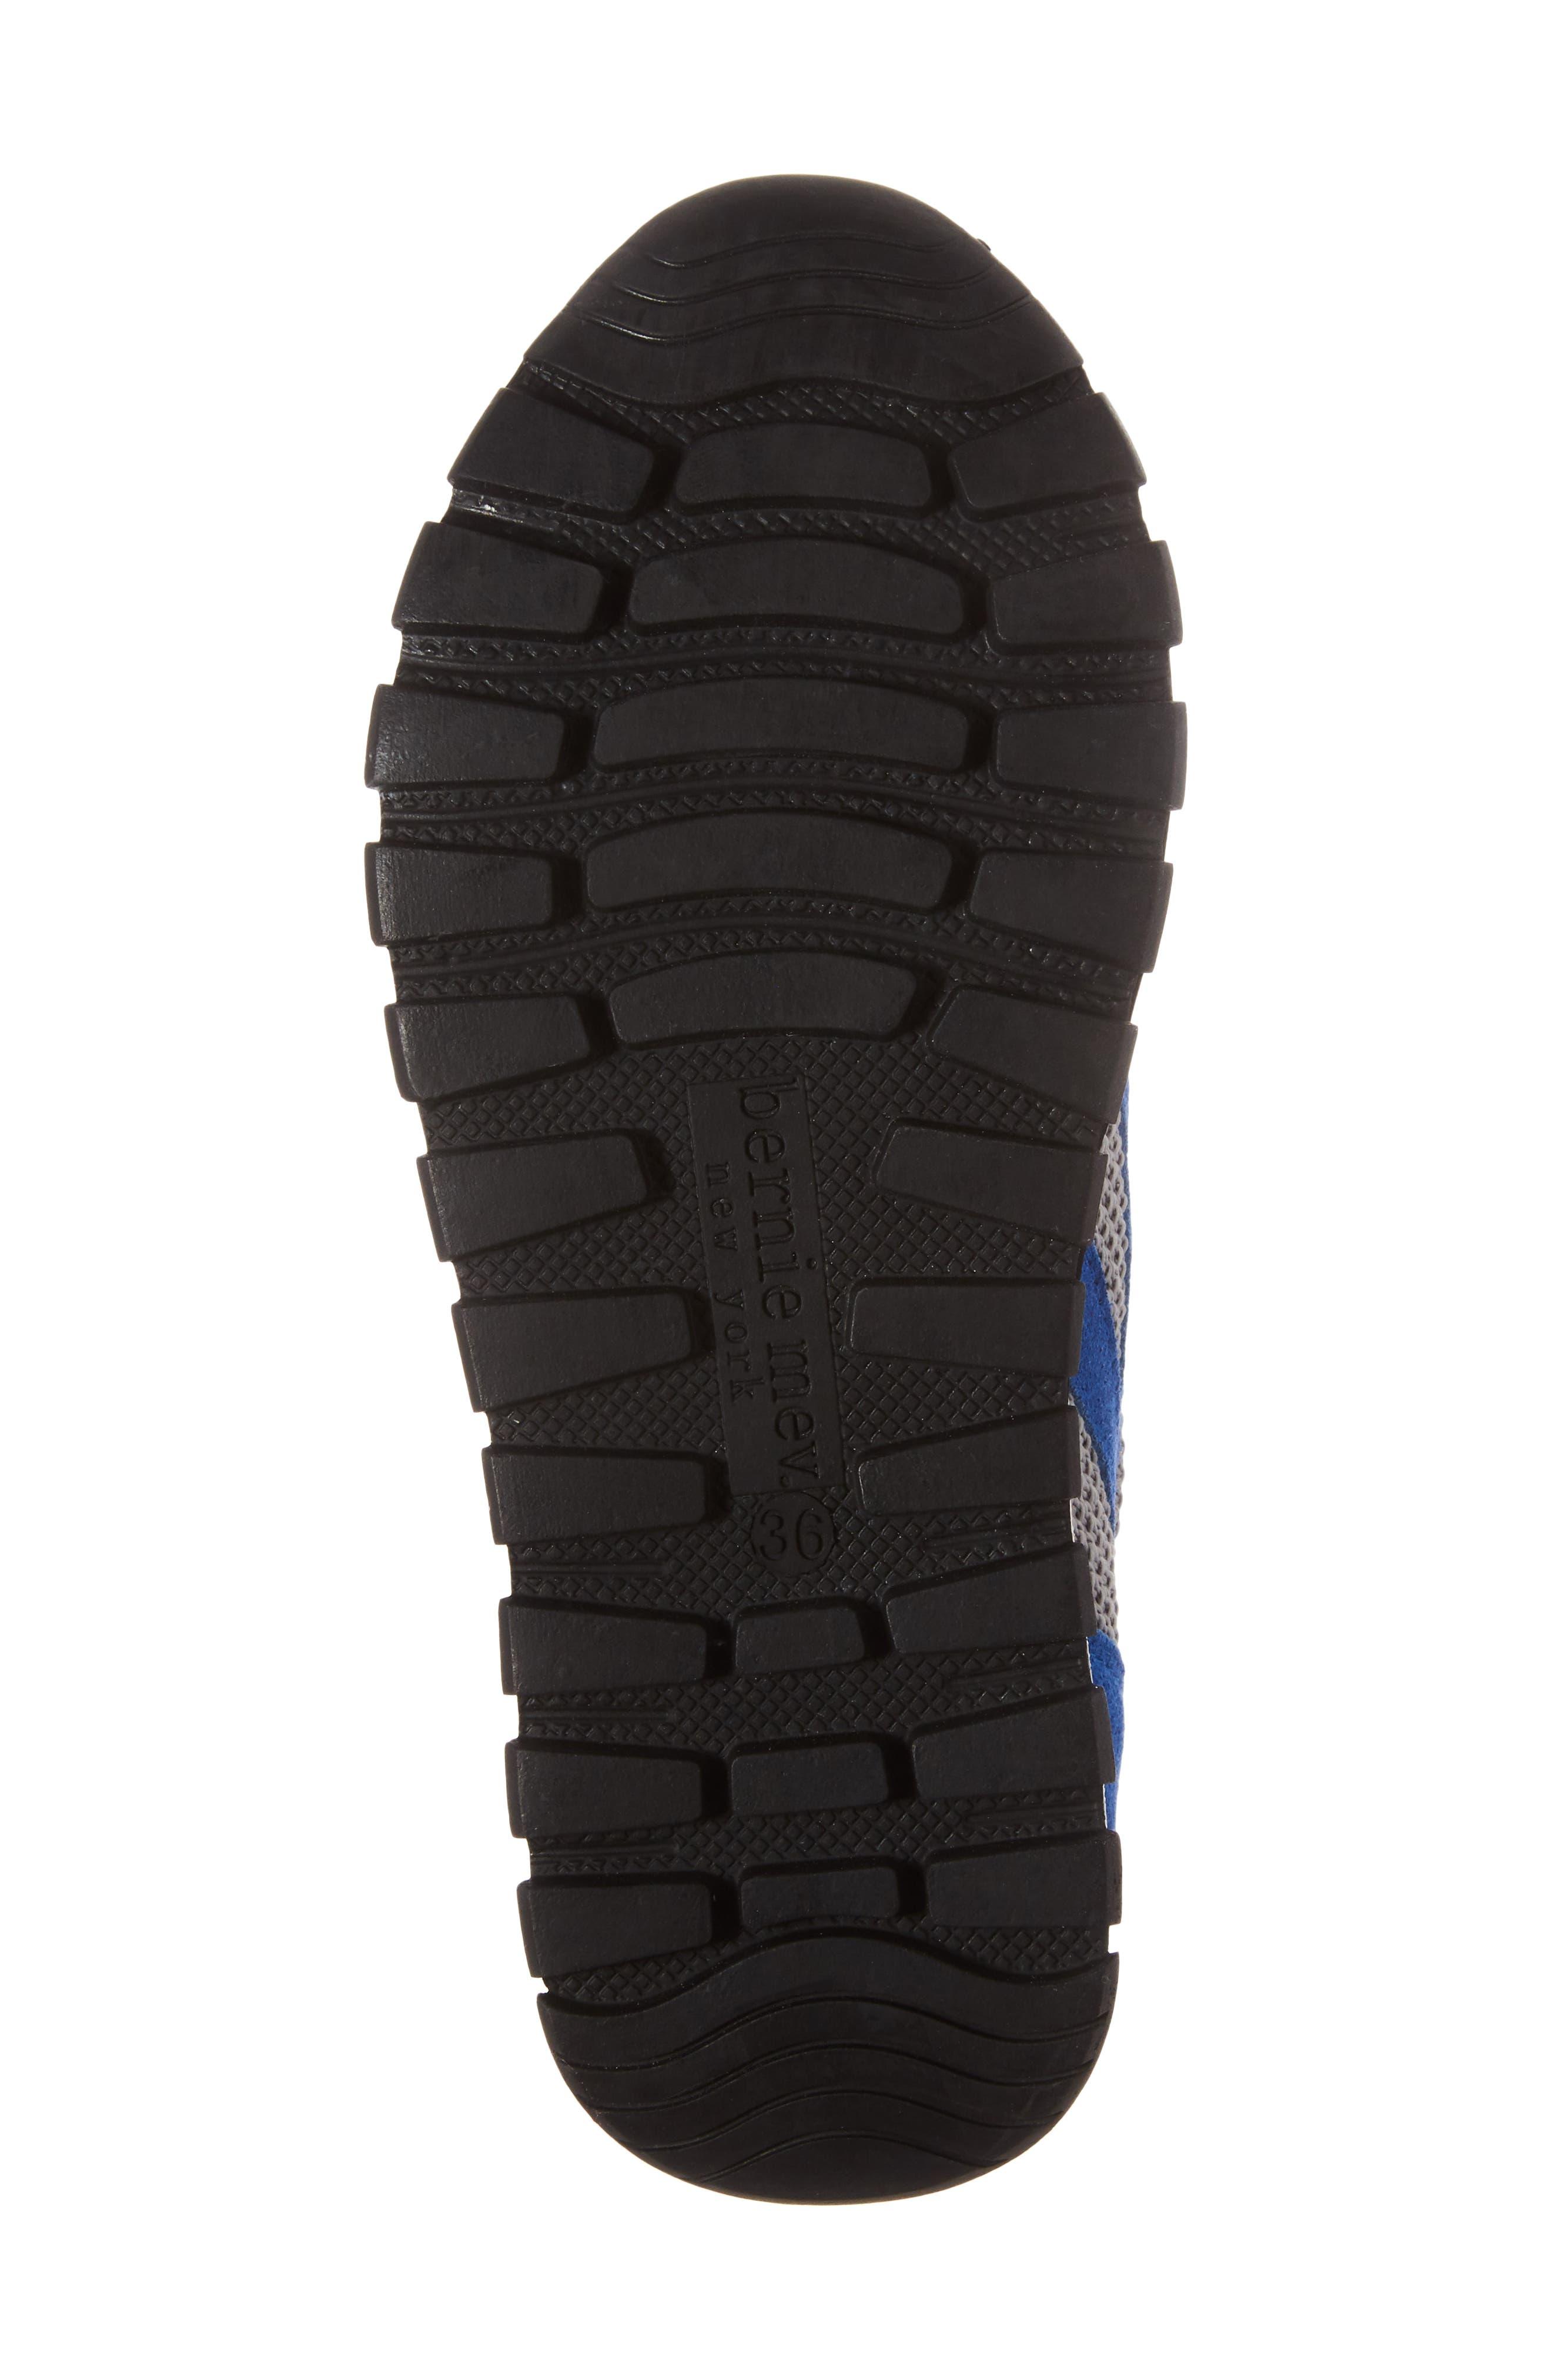 BERNIE MEV., Bernie Mev Tara Cano Sneaker, Alternate thumbnail 6, color, ROYAL BLUE/ GREY FABRIC